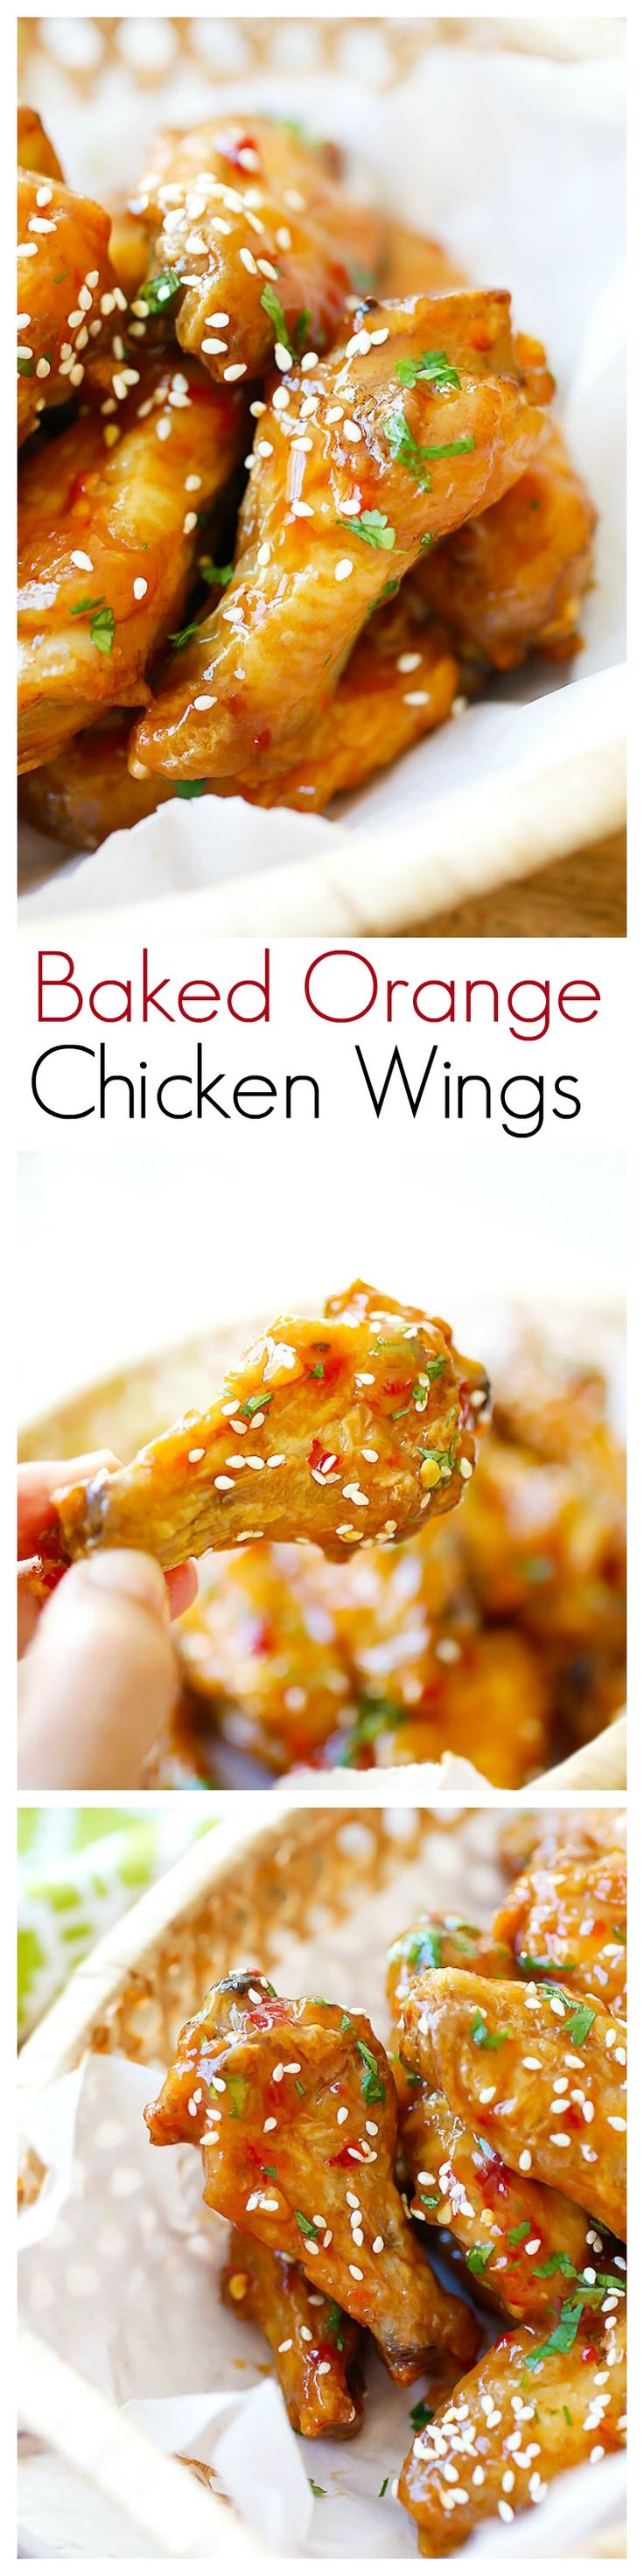 Baked Orange Chicken Wings - crispy, sticky baked wings (no frying) in an amazeballs orange sauce, so yummy | rasamalaysia.com | @justataste